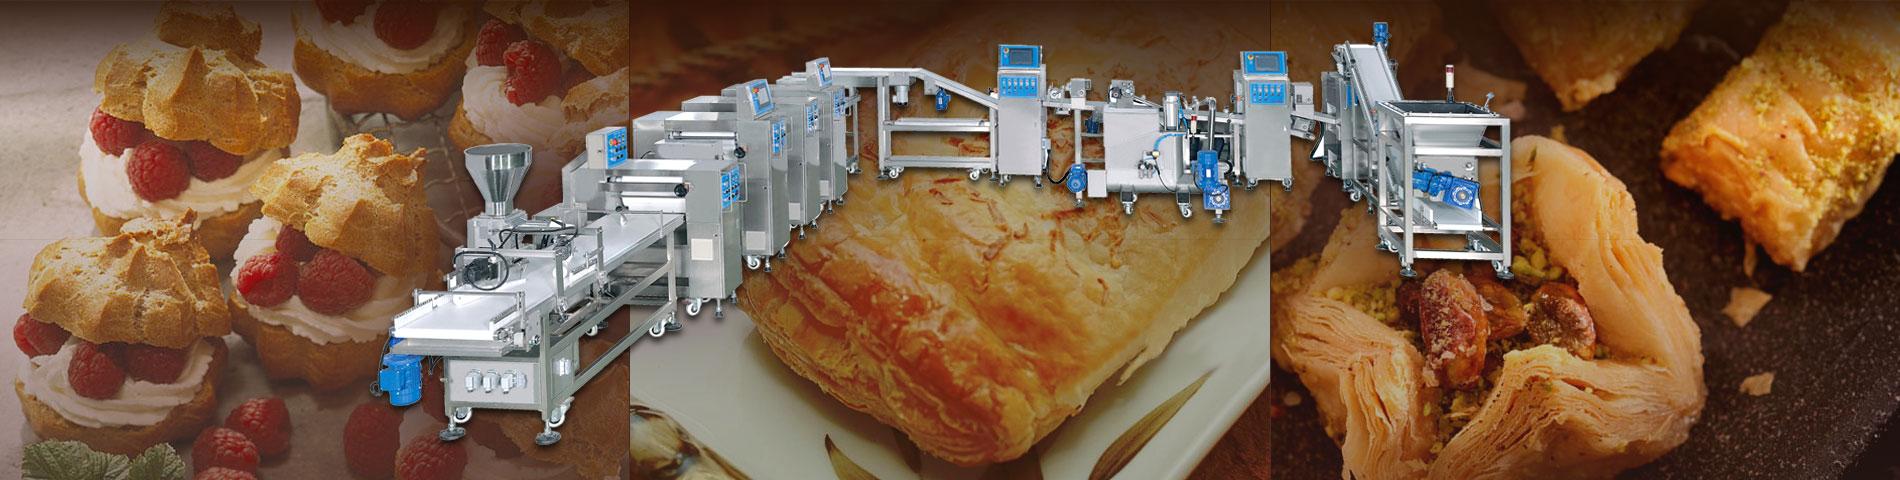 松塔、酥皮食品 TY3000L pastry machine